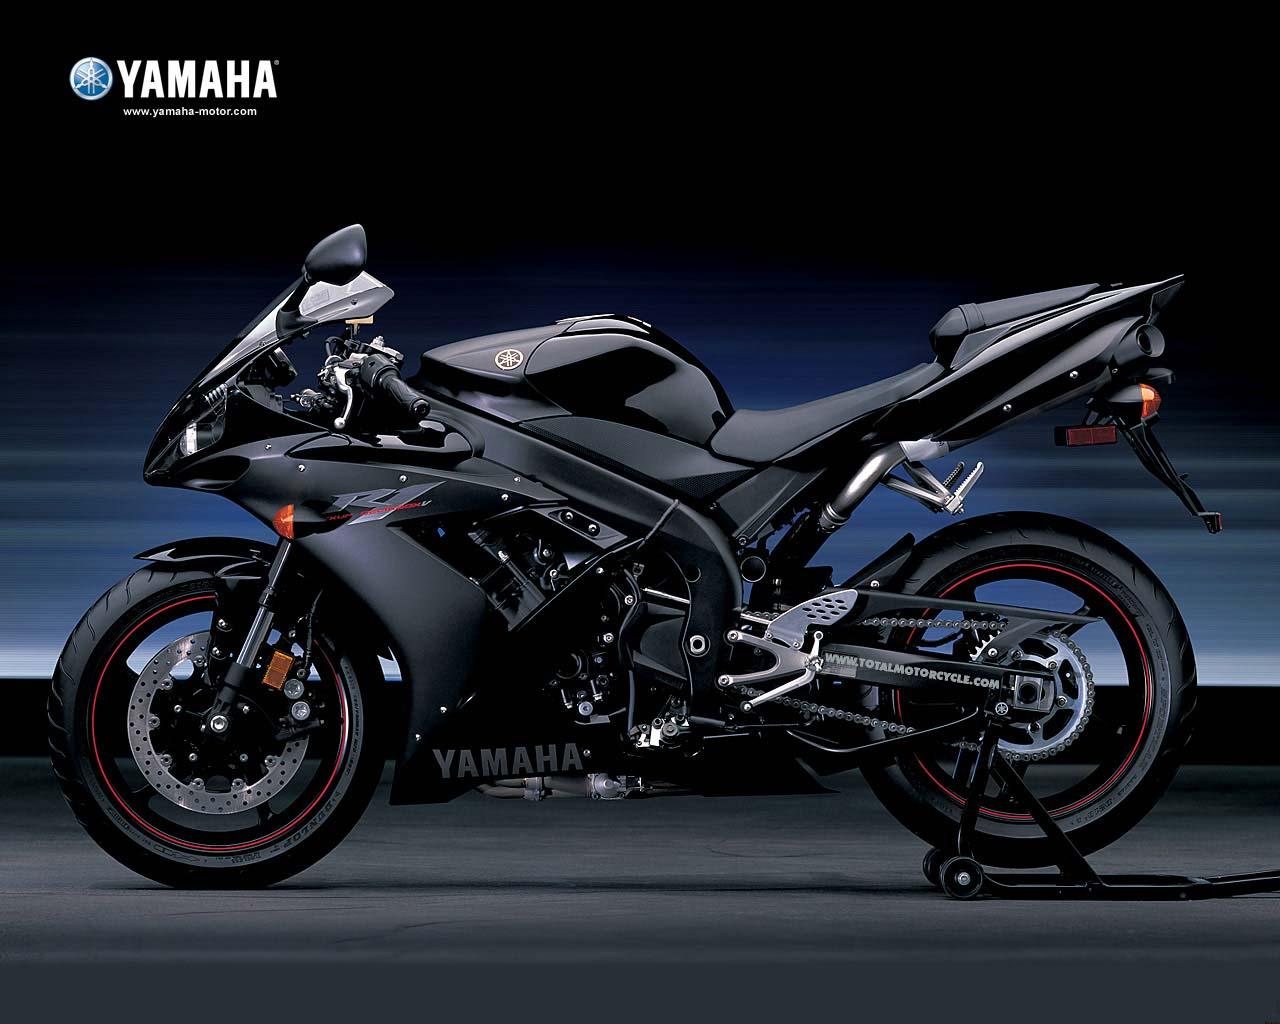 https://1.bp.blogspot.com/-WbQH4fhhTmU/TpVQeFRmfCI/AAAAAAAAAUw/n8PrE22lkmU/s1600/2005-Yamaha-R1a-JAMSON.jpg